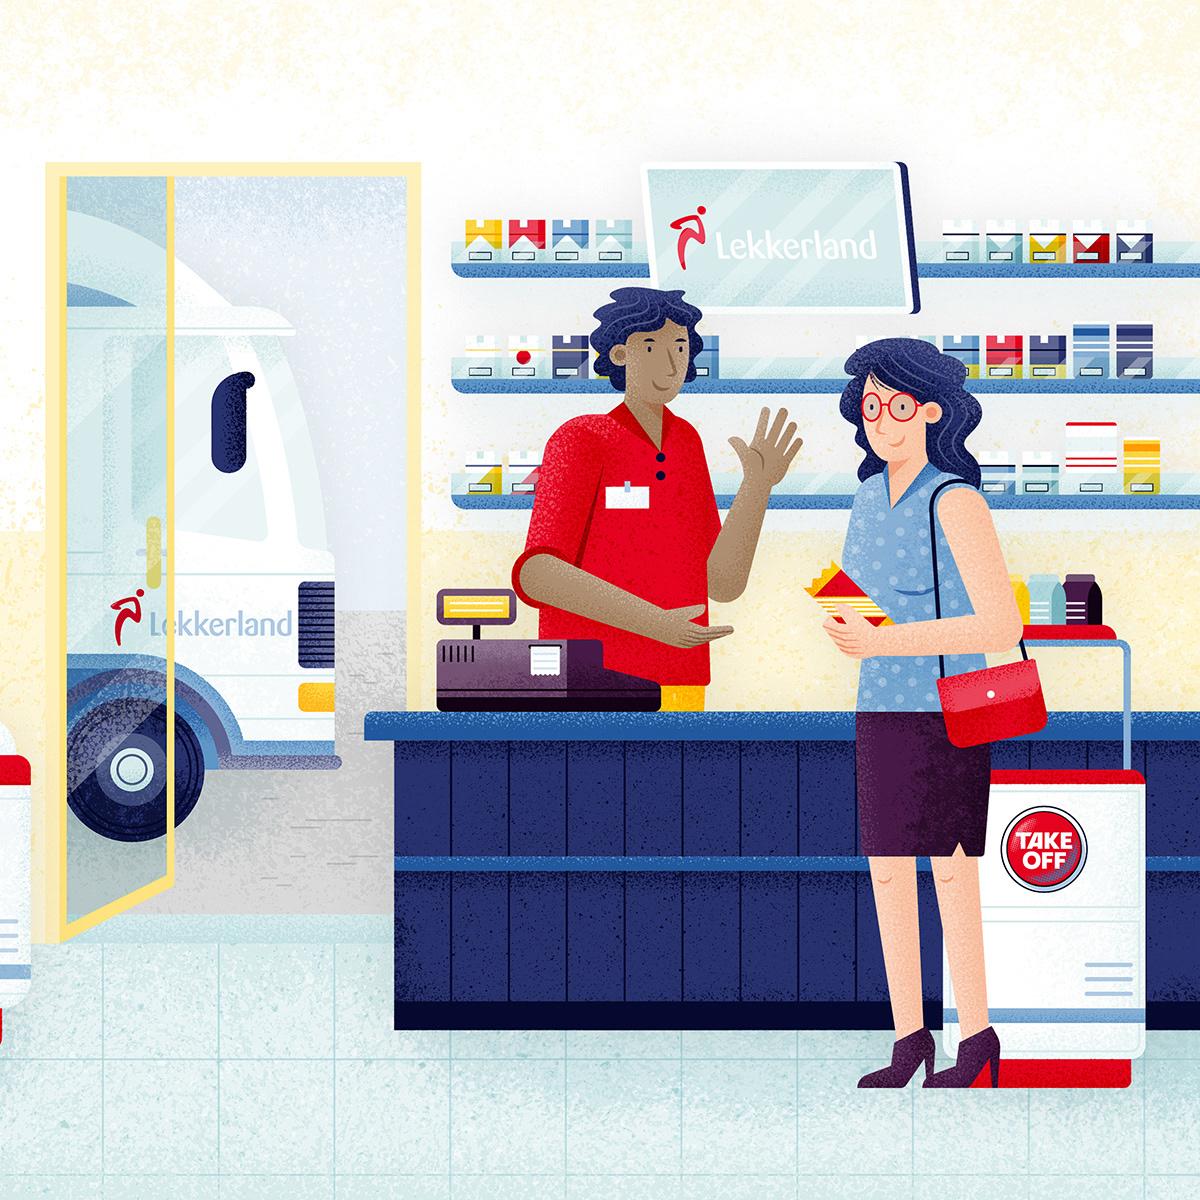 Editorial Illustration ILLUSTRATION  Magazine illustration flat illustration corporate illustration Vectorillustration vector people Food  Food service industry